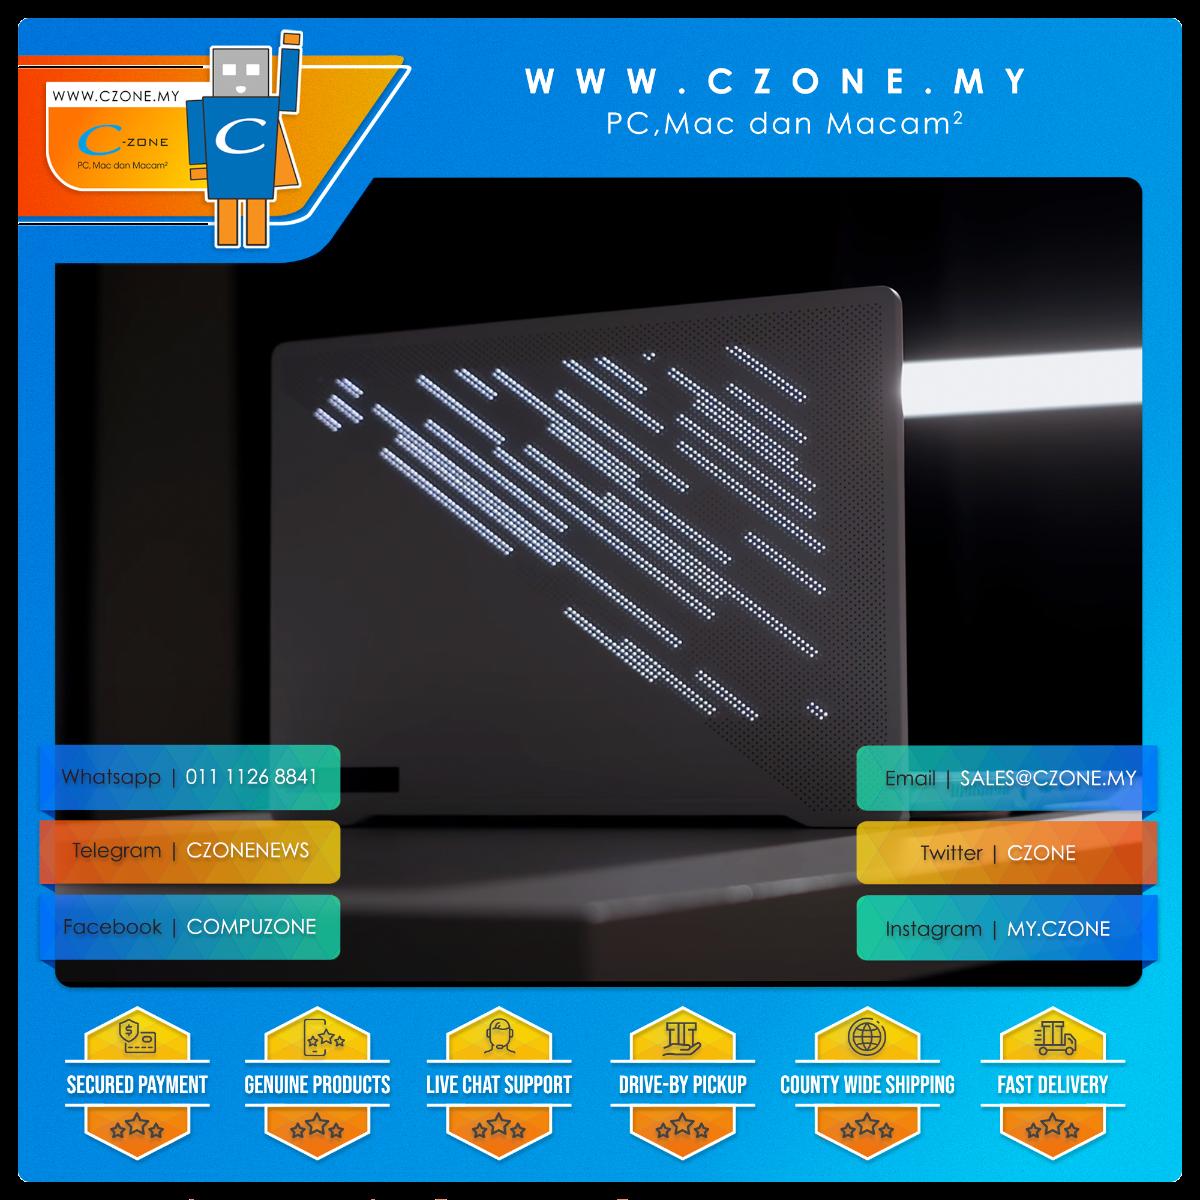 https://czone.my/czone/computer-systems/laptops.html?brand=5495